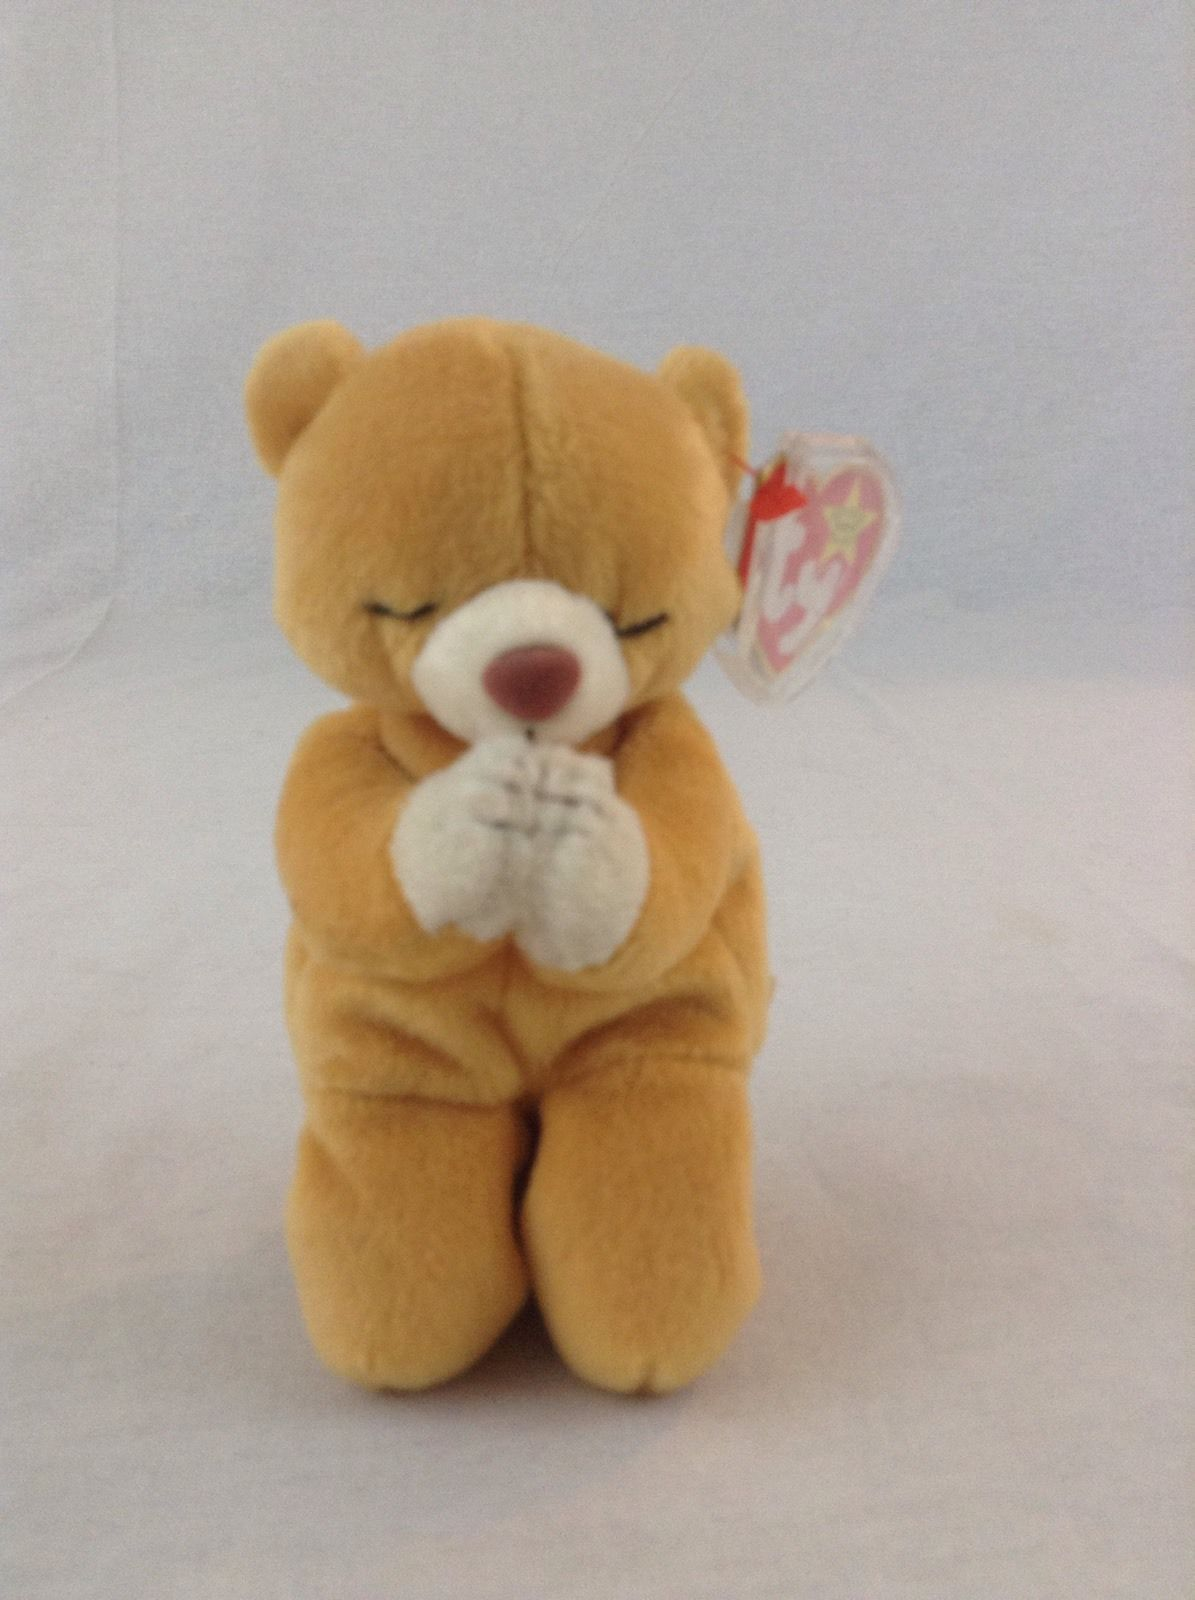 1999 Ty Beanie Baby Hope Praying Teddy Bear And 10 Similar Items